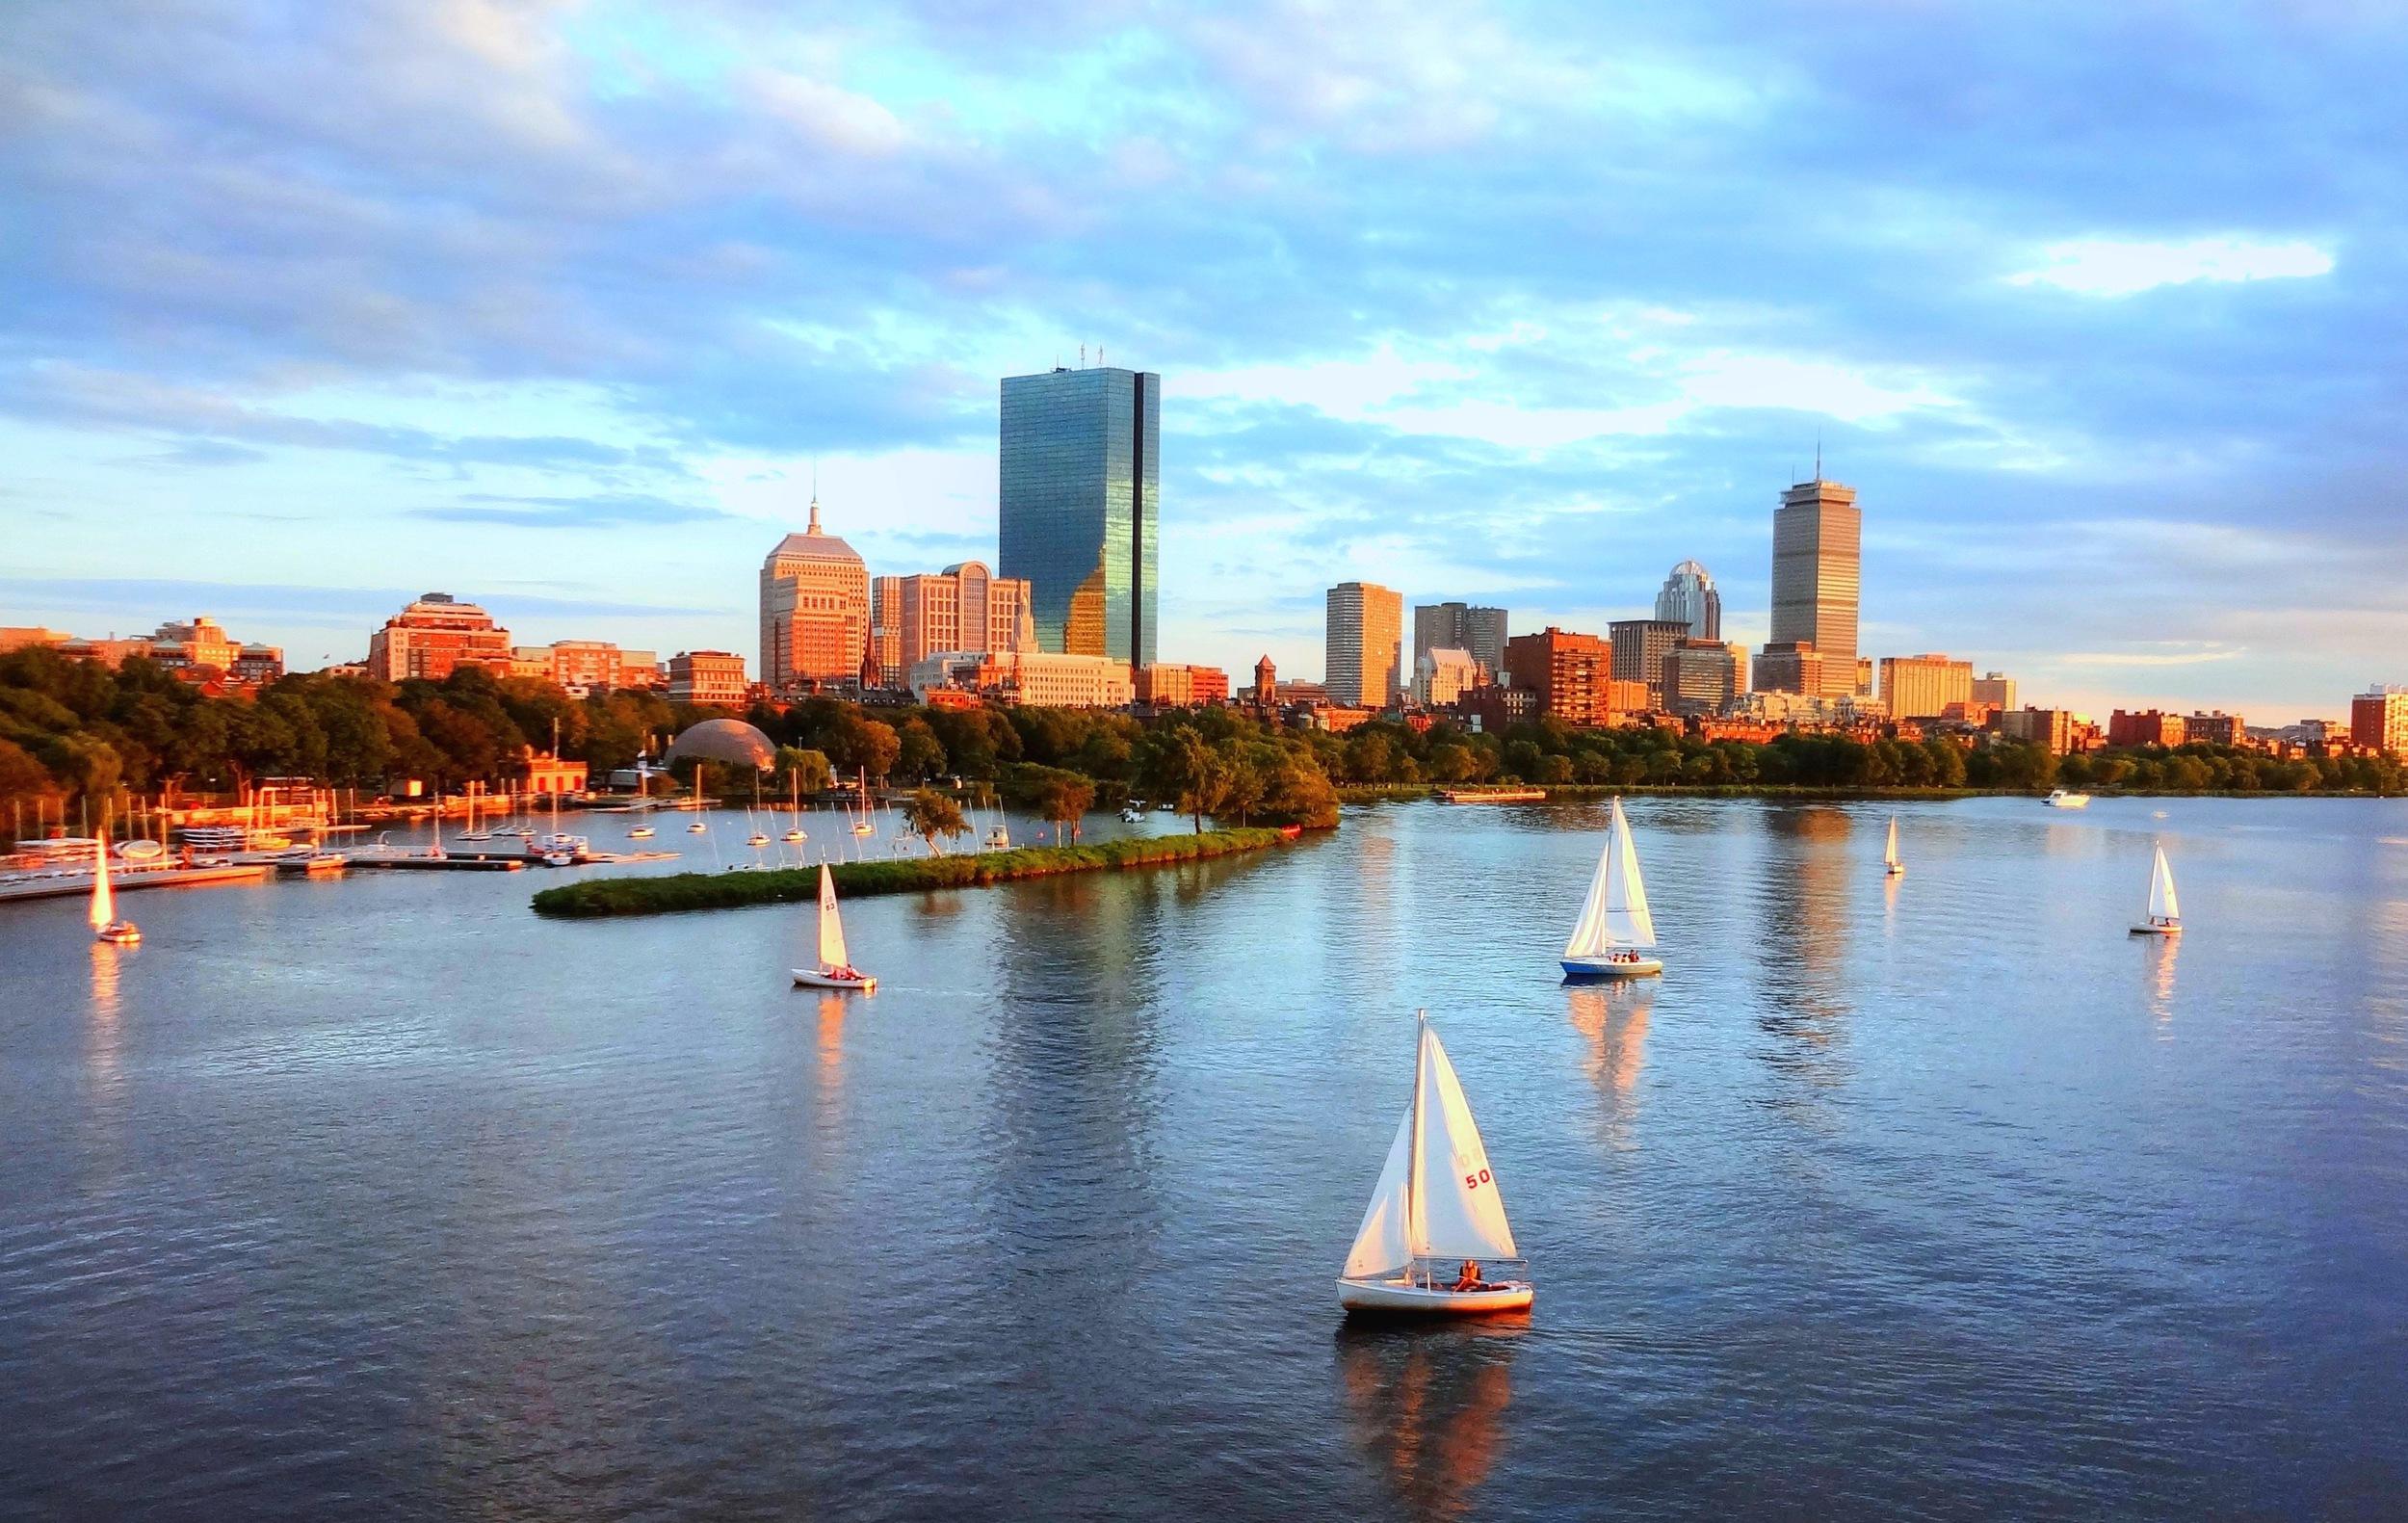 Back Bay and Charles River, Boston, MA